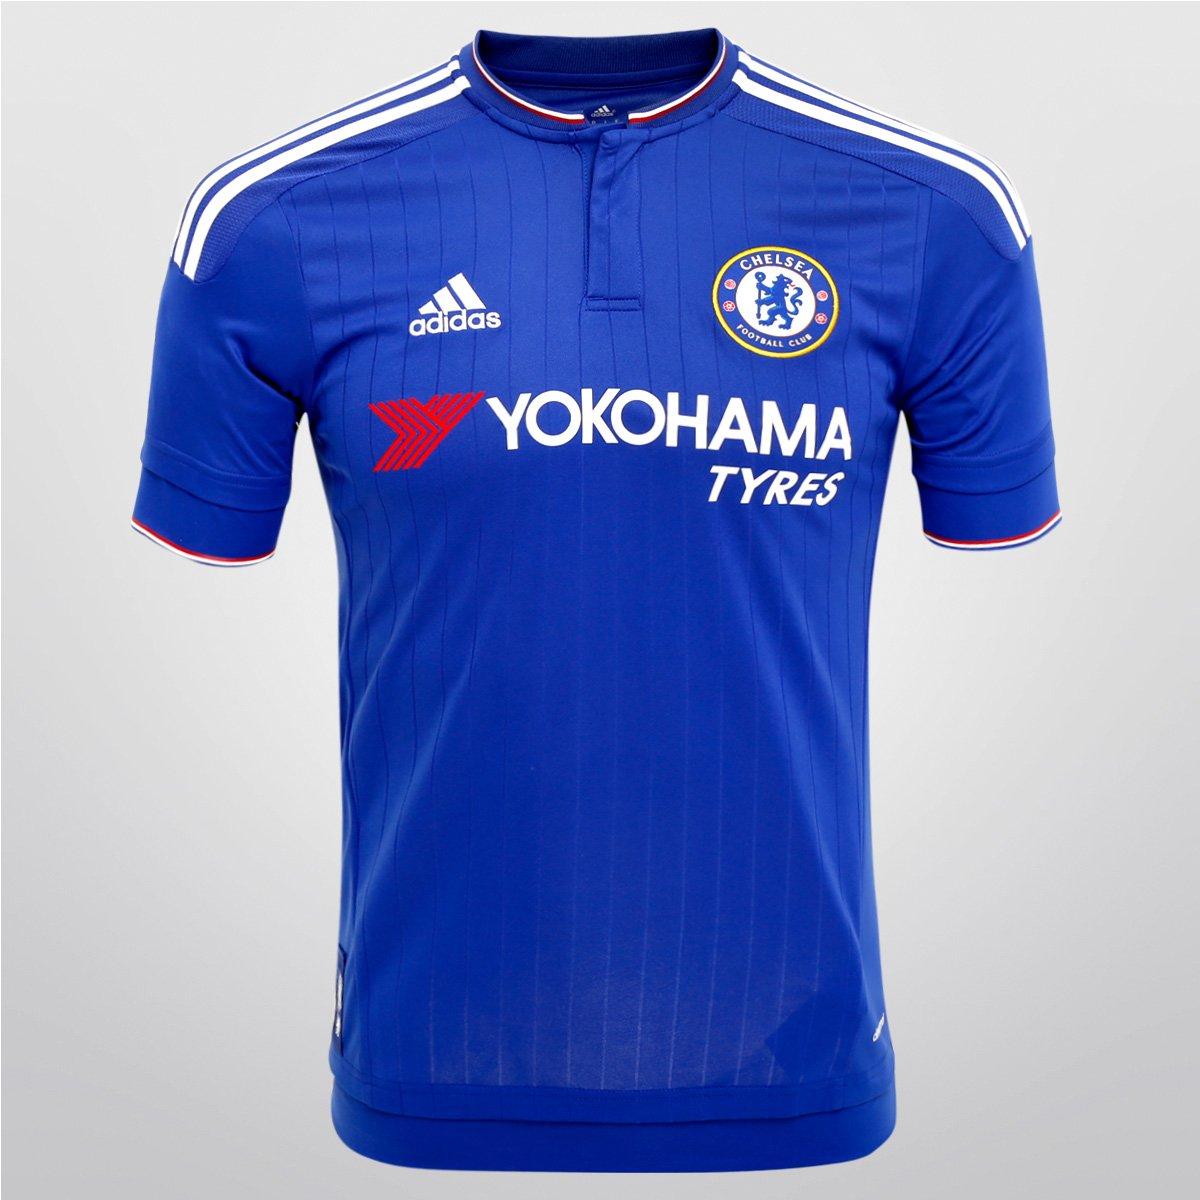 566c2fe90635c Camisa Adidas Chelsea Home 15/16 s/nº | Netshoes